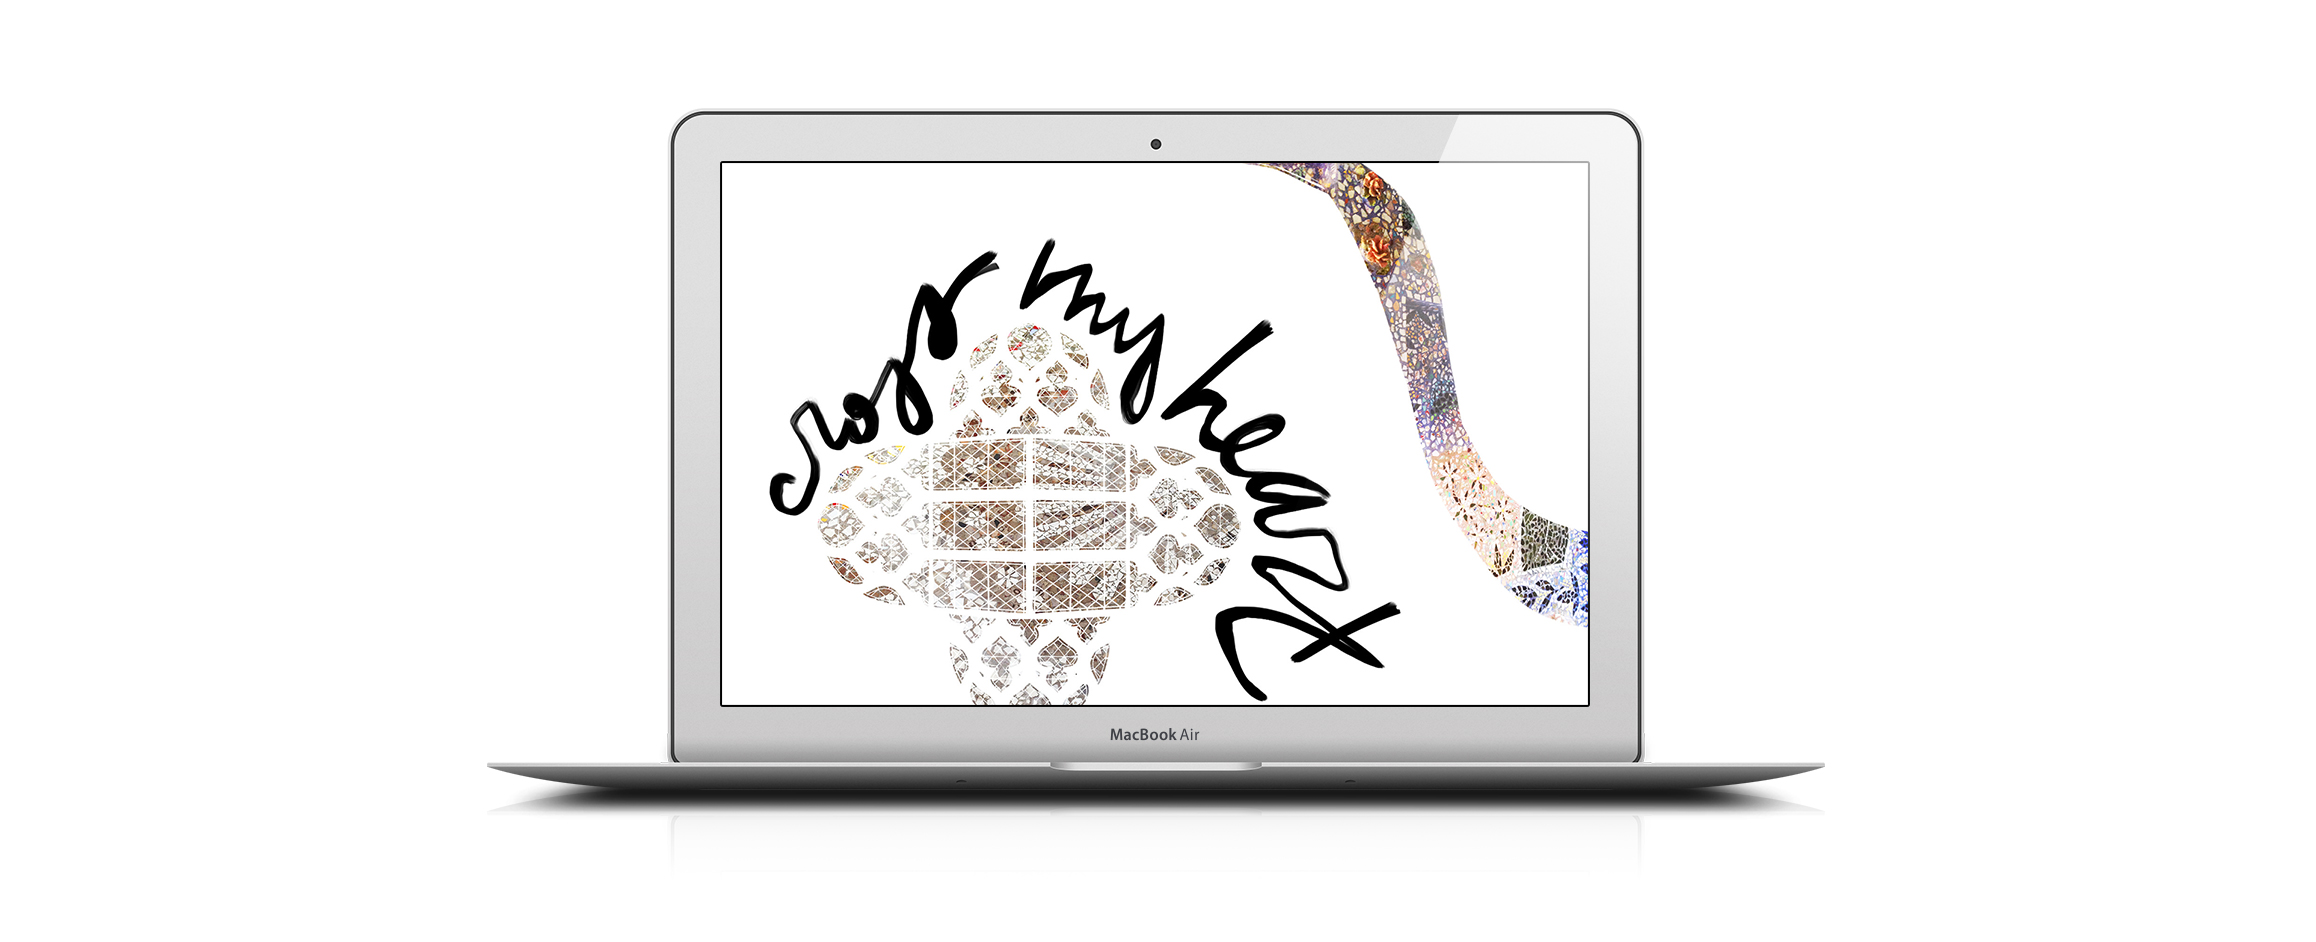 Cross-My-Heart-Wallpaper-Download-DX5